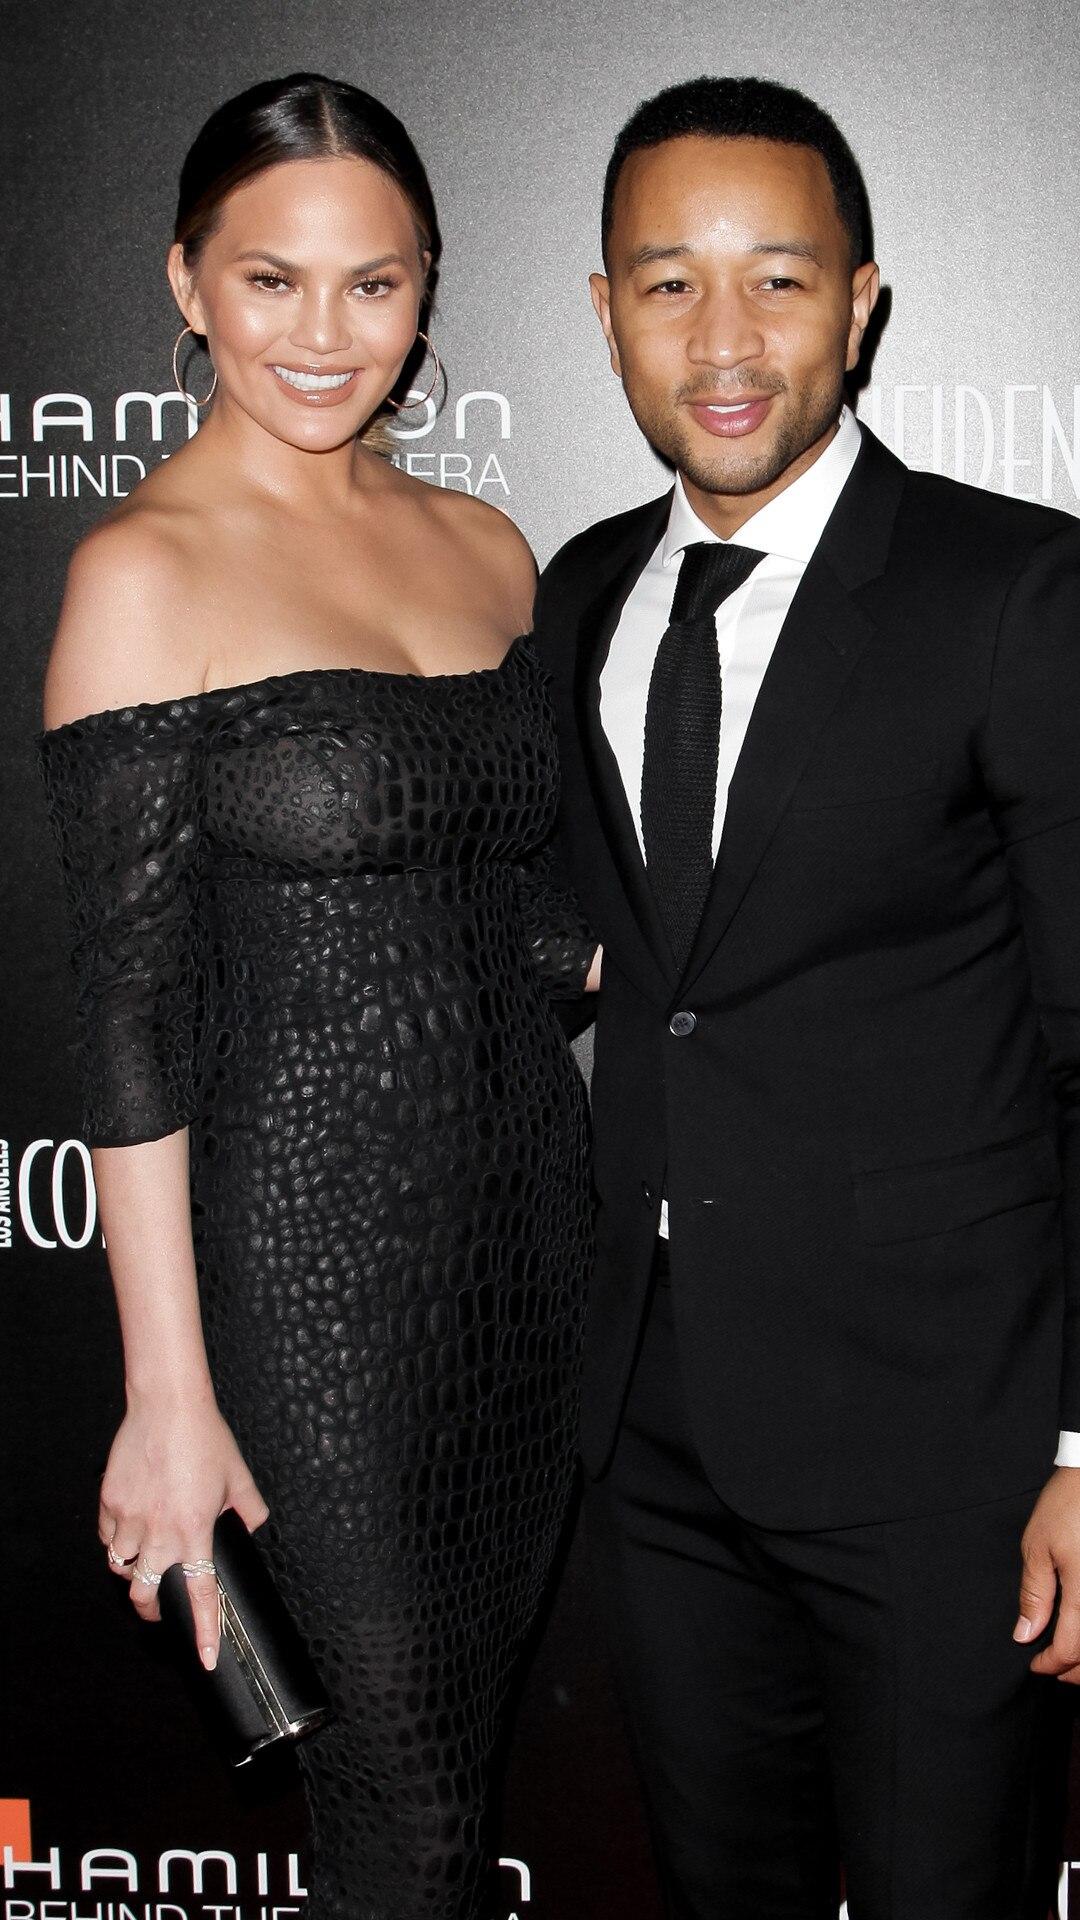 Chrissy Teigen, John Legend, Behind The Camera Awards